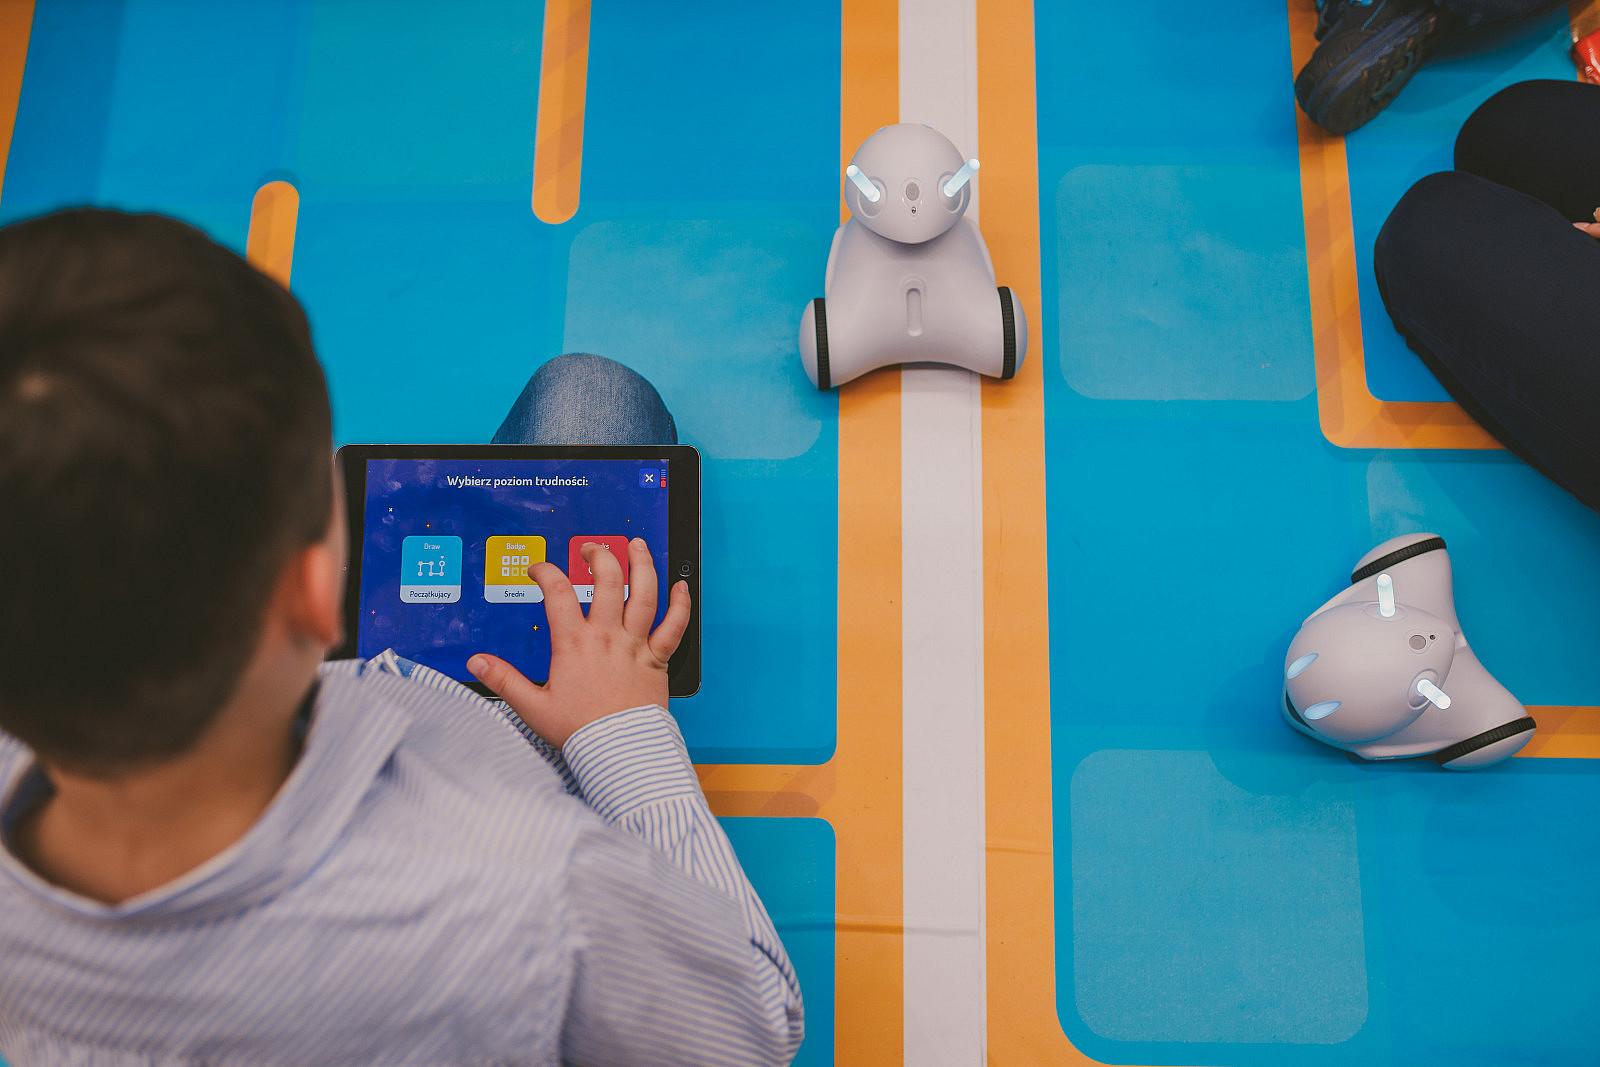 Kit 8 robot Photon + 1 Magic Dongle + 1 tappetino educativo